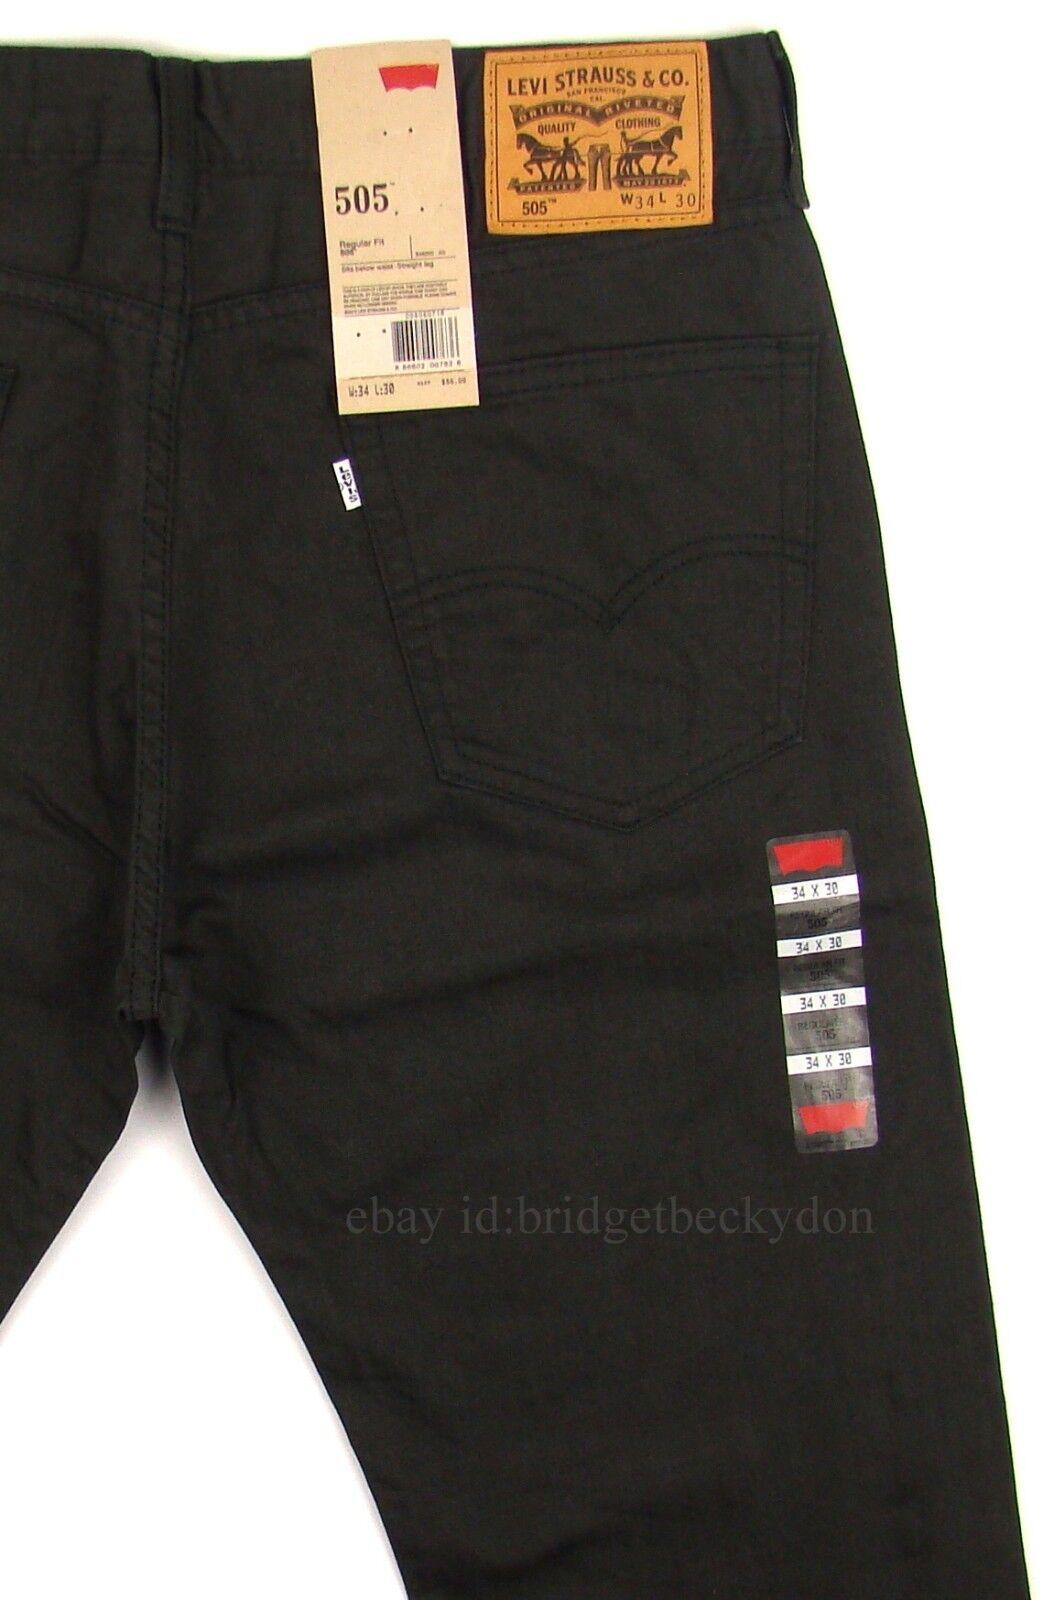 9355ed73209 Levis 505 Jeans New Mens Regular Fit Straight Leg 29 30 31 32 33 34 36